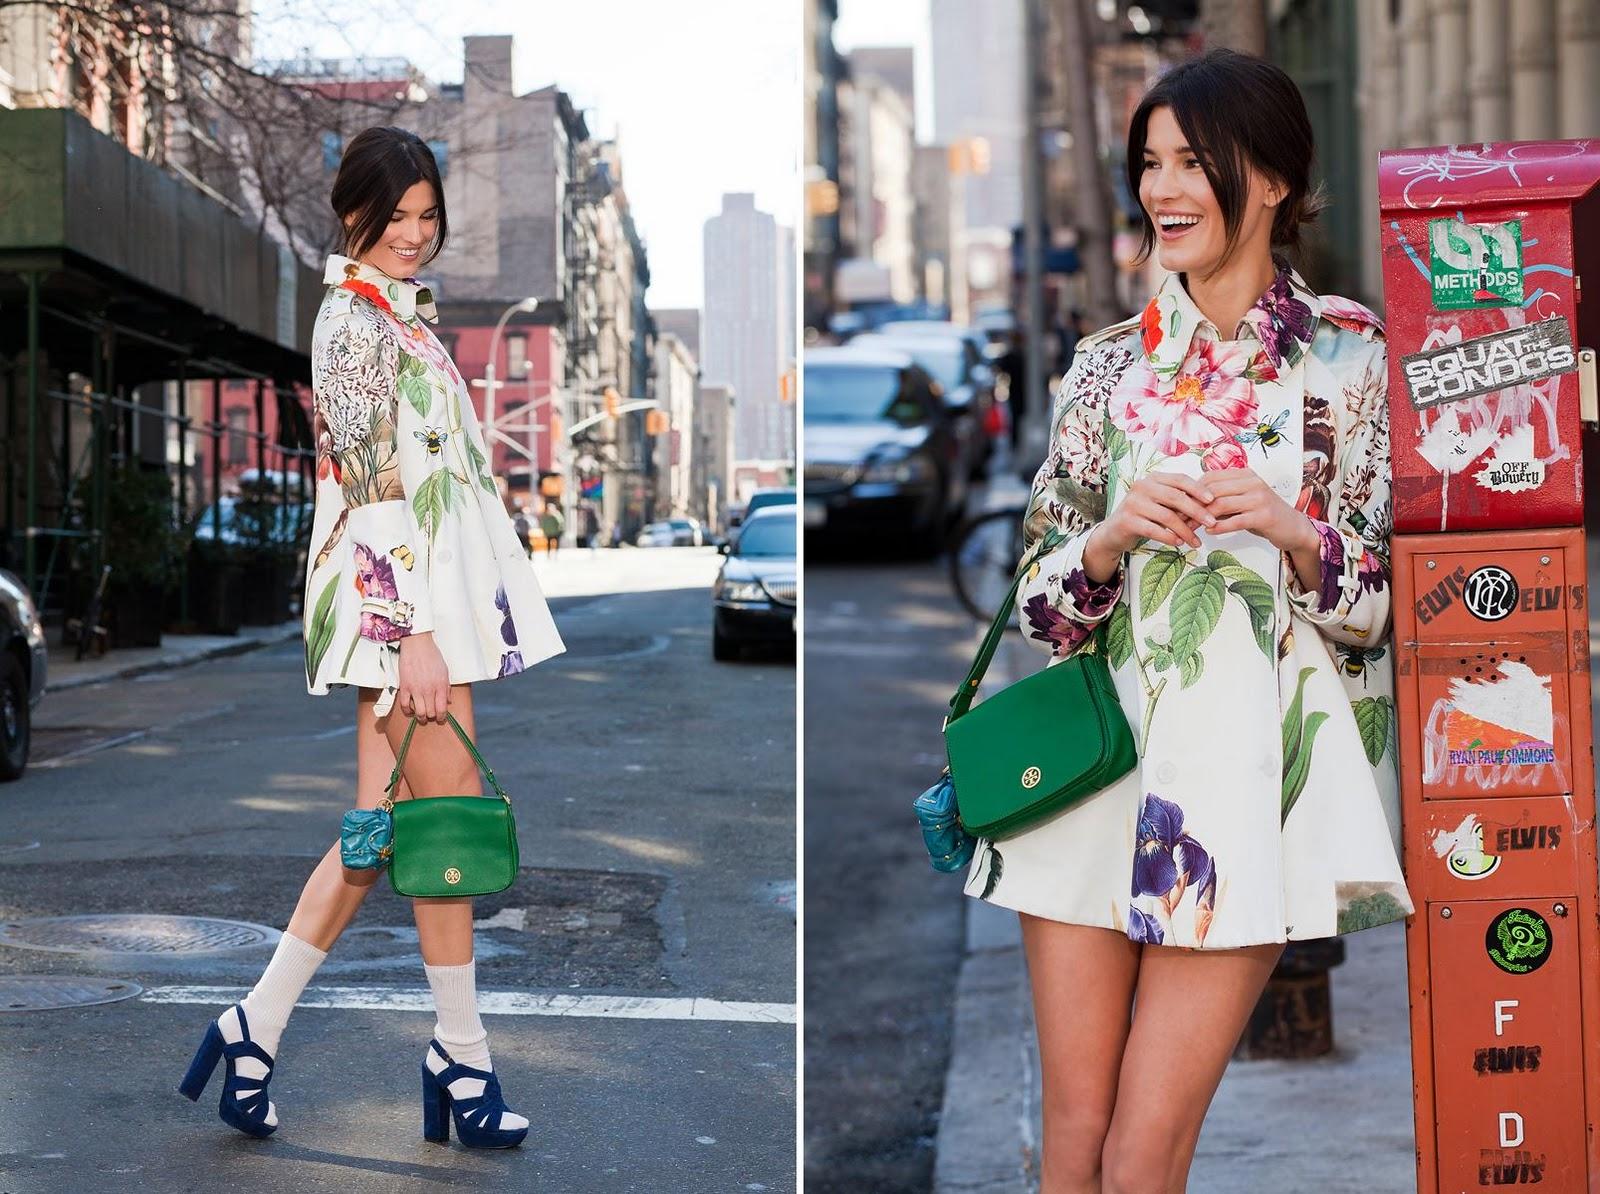 http://4.bp.blogspot.com/-aykNFJ9HXsM/TZAoiUJw3NI/AAAAAAAAEfA/ugjz3txyArw/s1600/hanneli-mustaparta-five-days-one-girl-vogue-magazine-five-looks-vogue-daily-march-2011-1.JPG